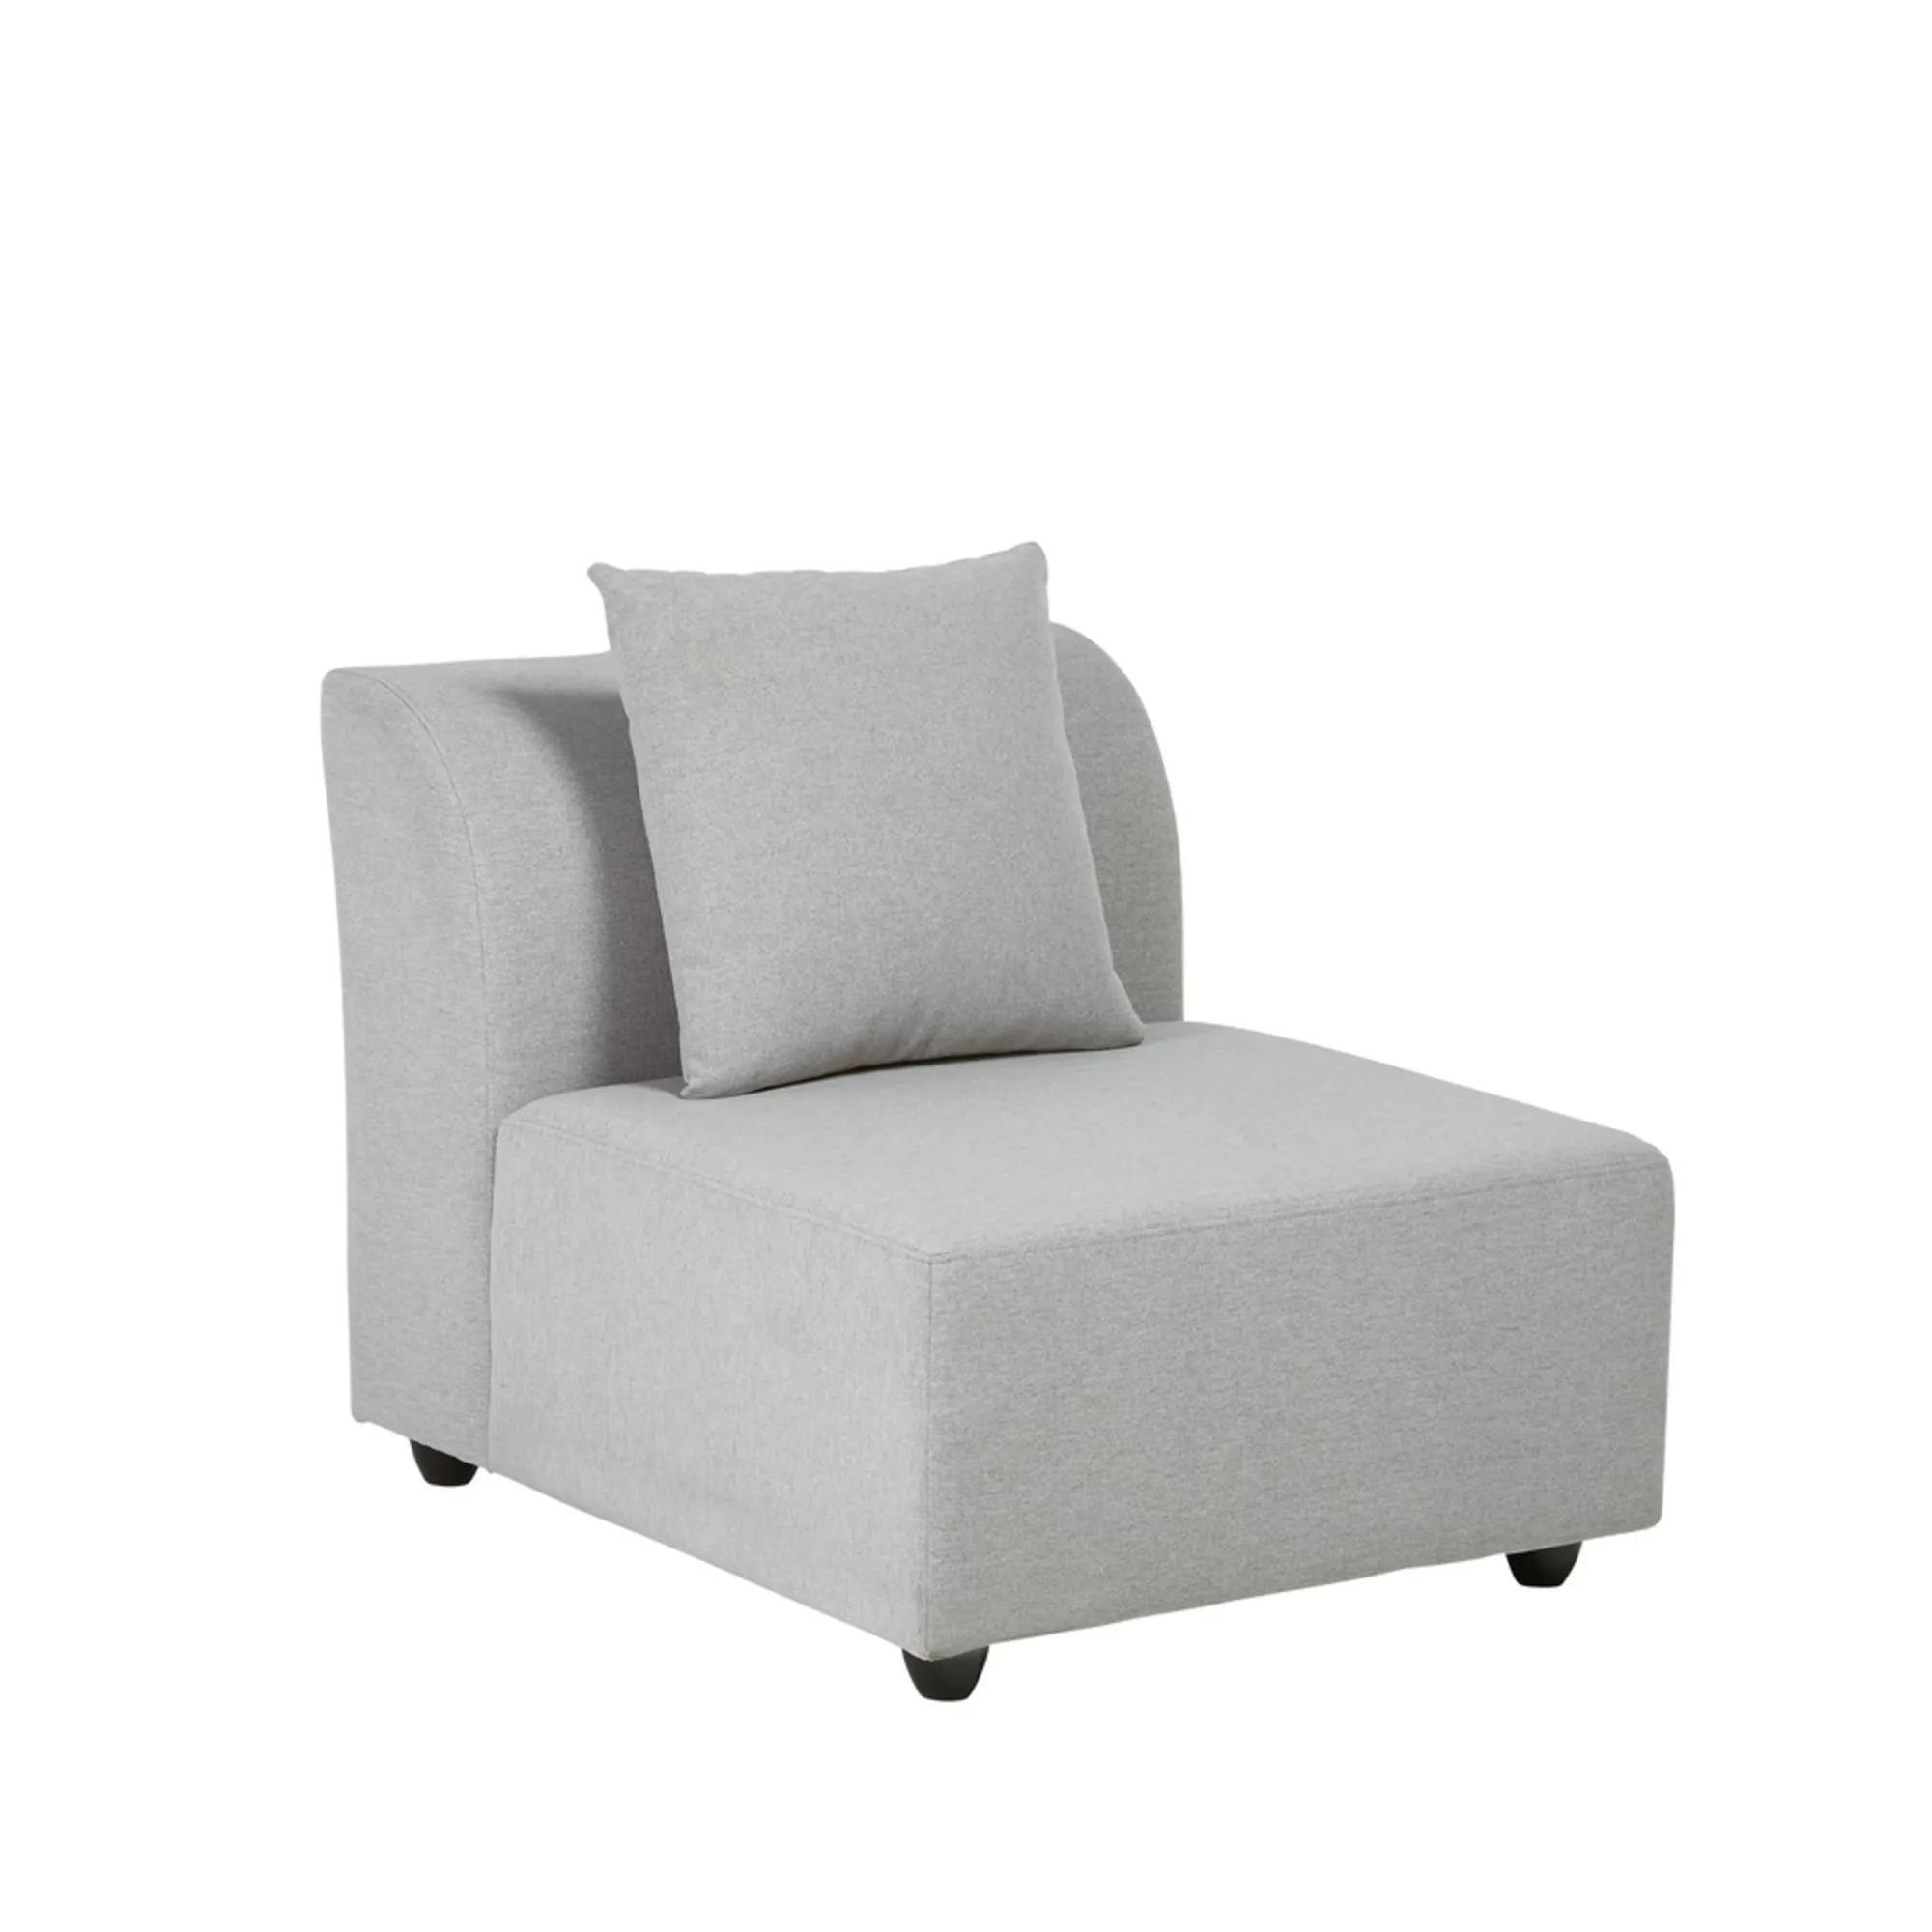 LUCY- Light gray modular sofa armchair